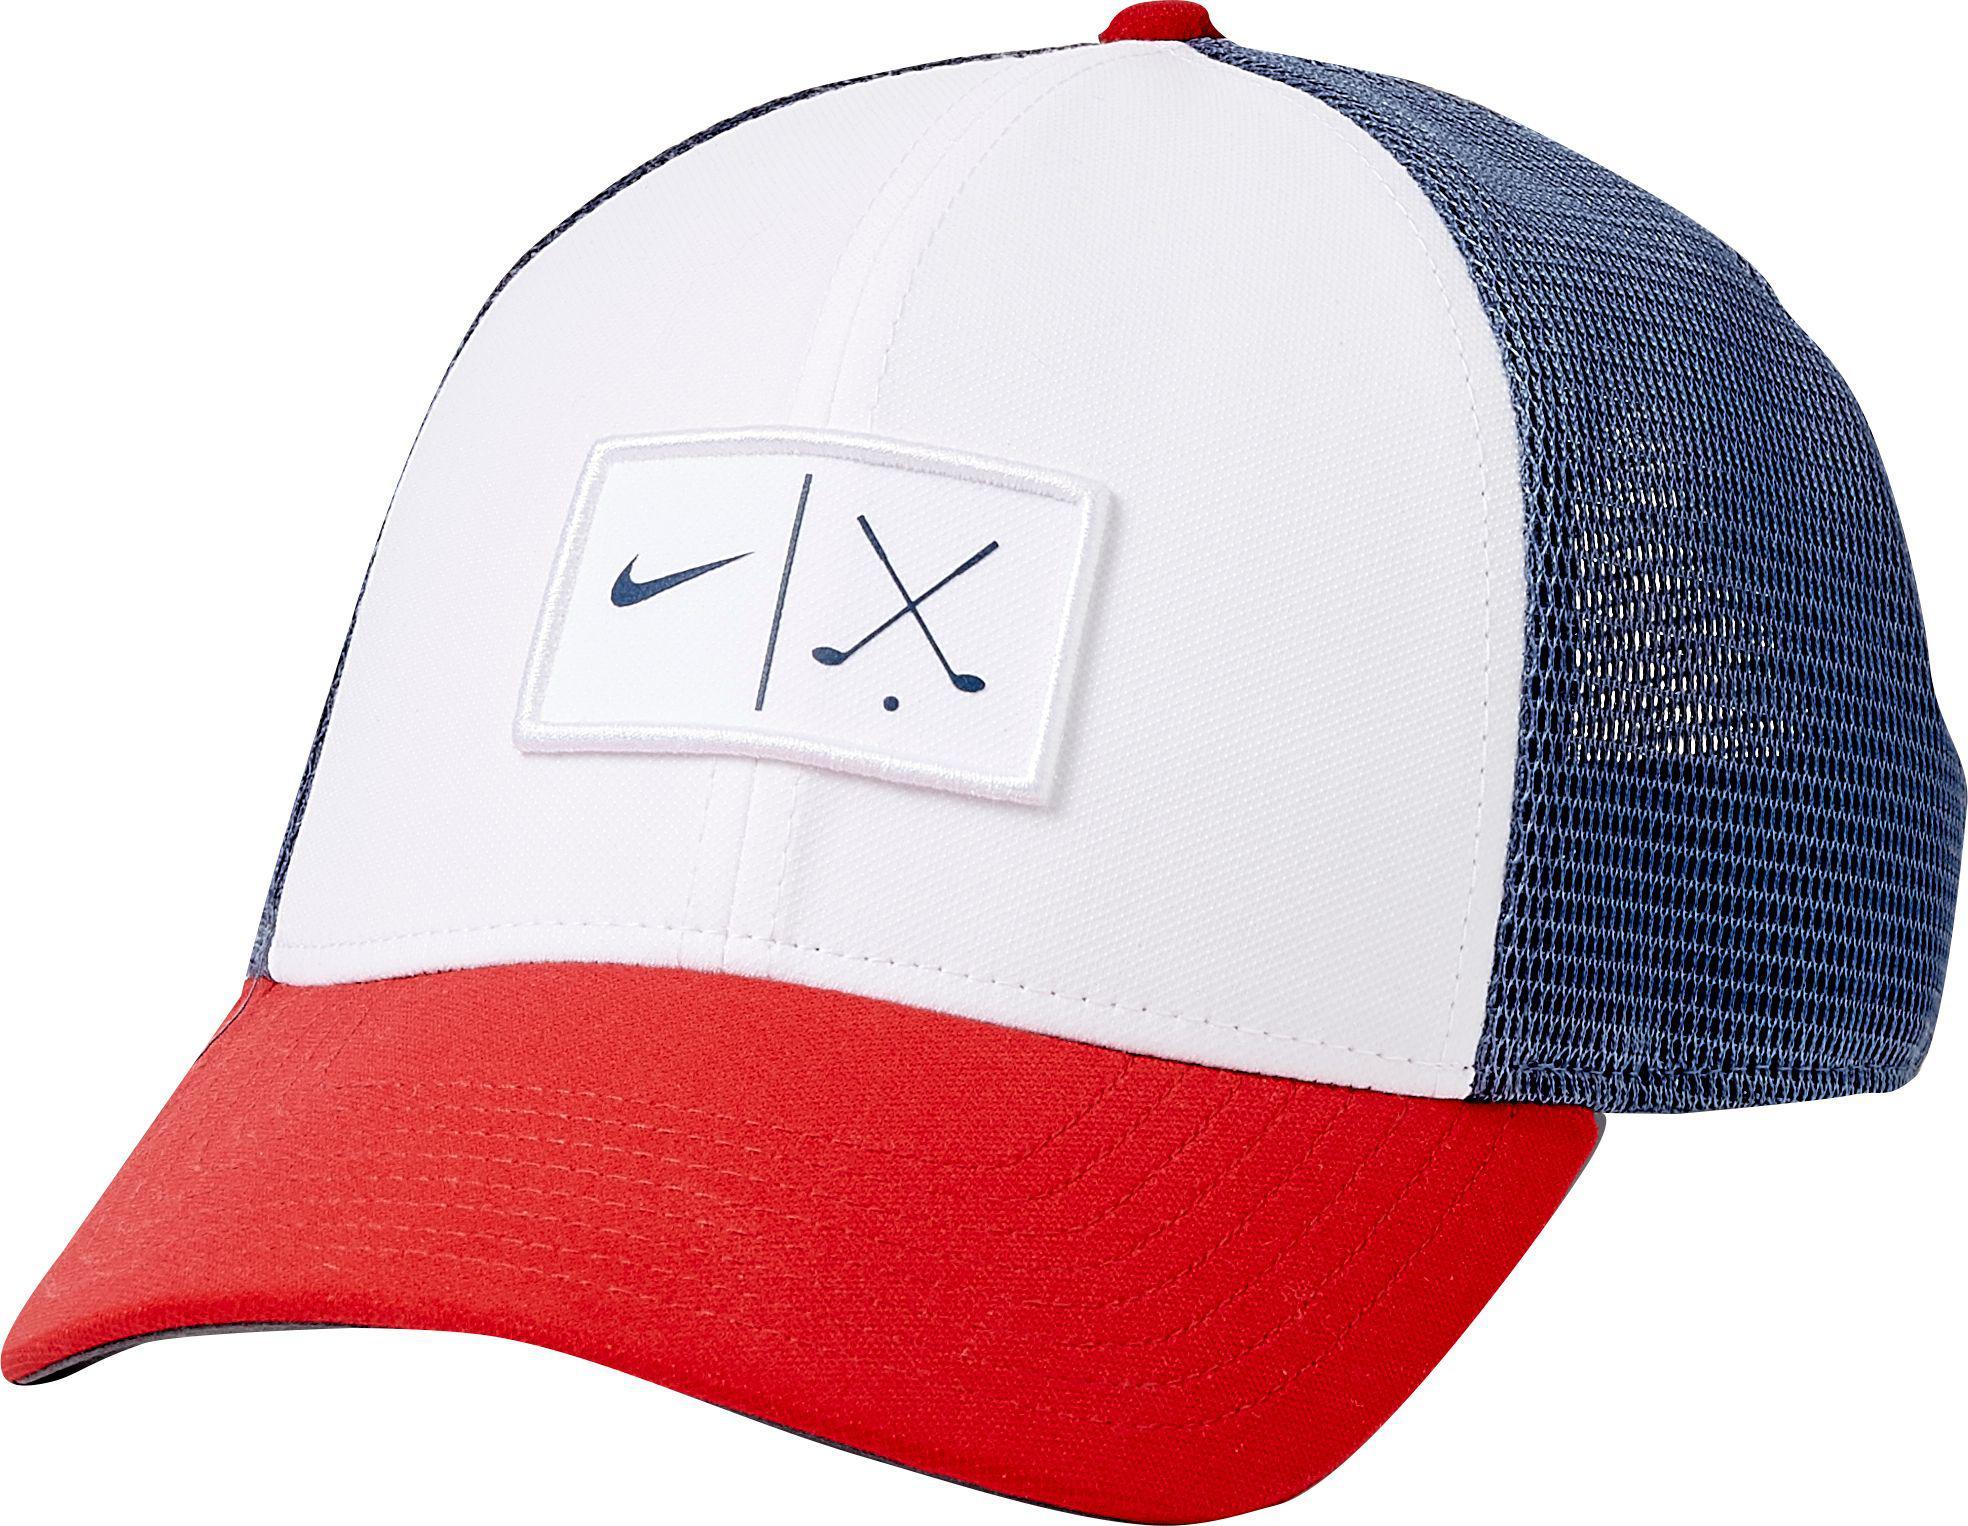 421ea6fae7a Lyst - Nike Mesh Golf Hat in Blue for Men